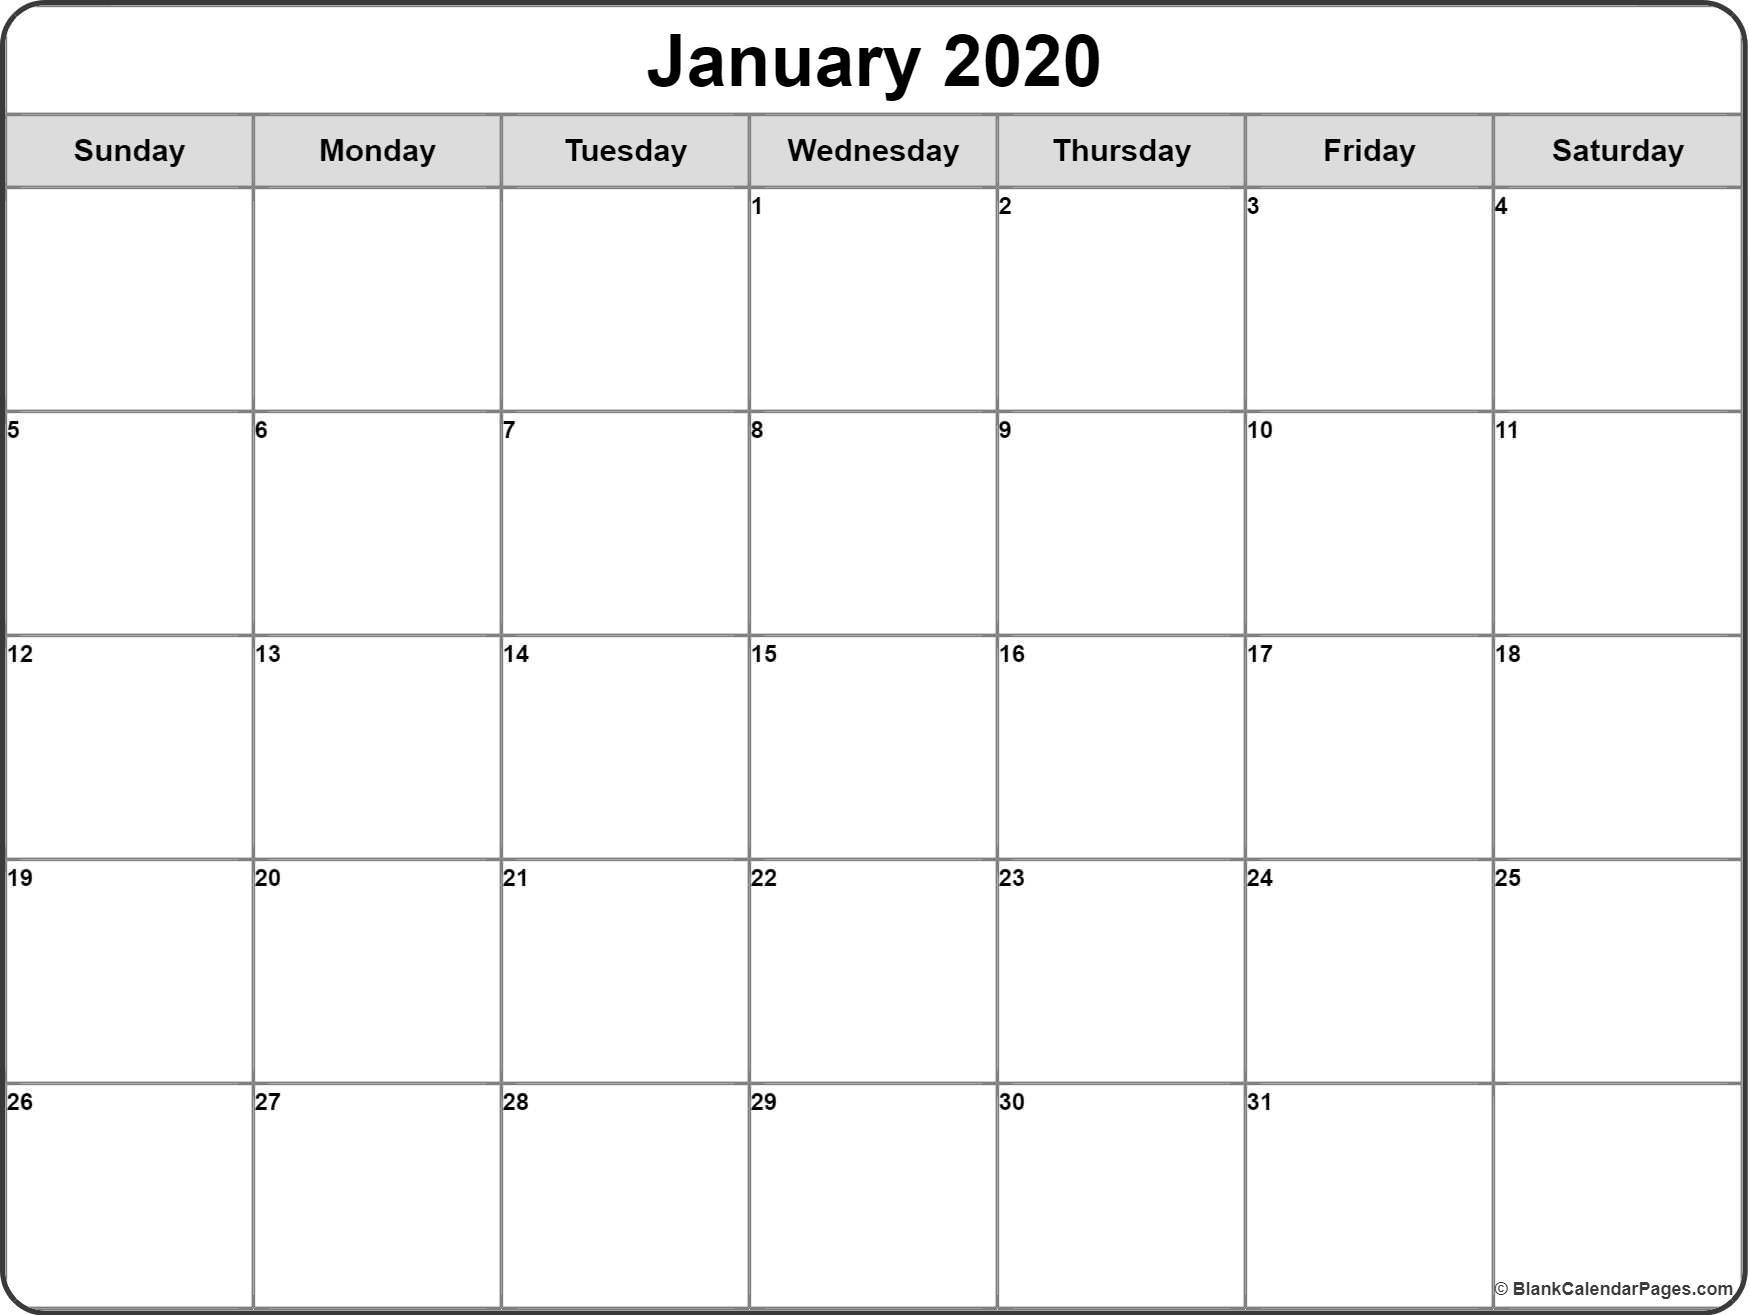 January 2020 Calendar | Free Printable Monthly Calendars  Blank Monthly Calendar Printable